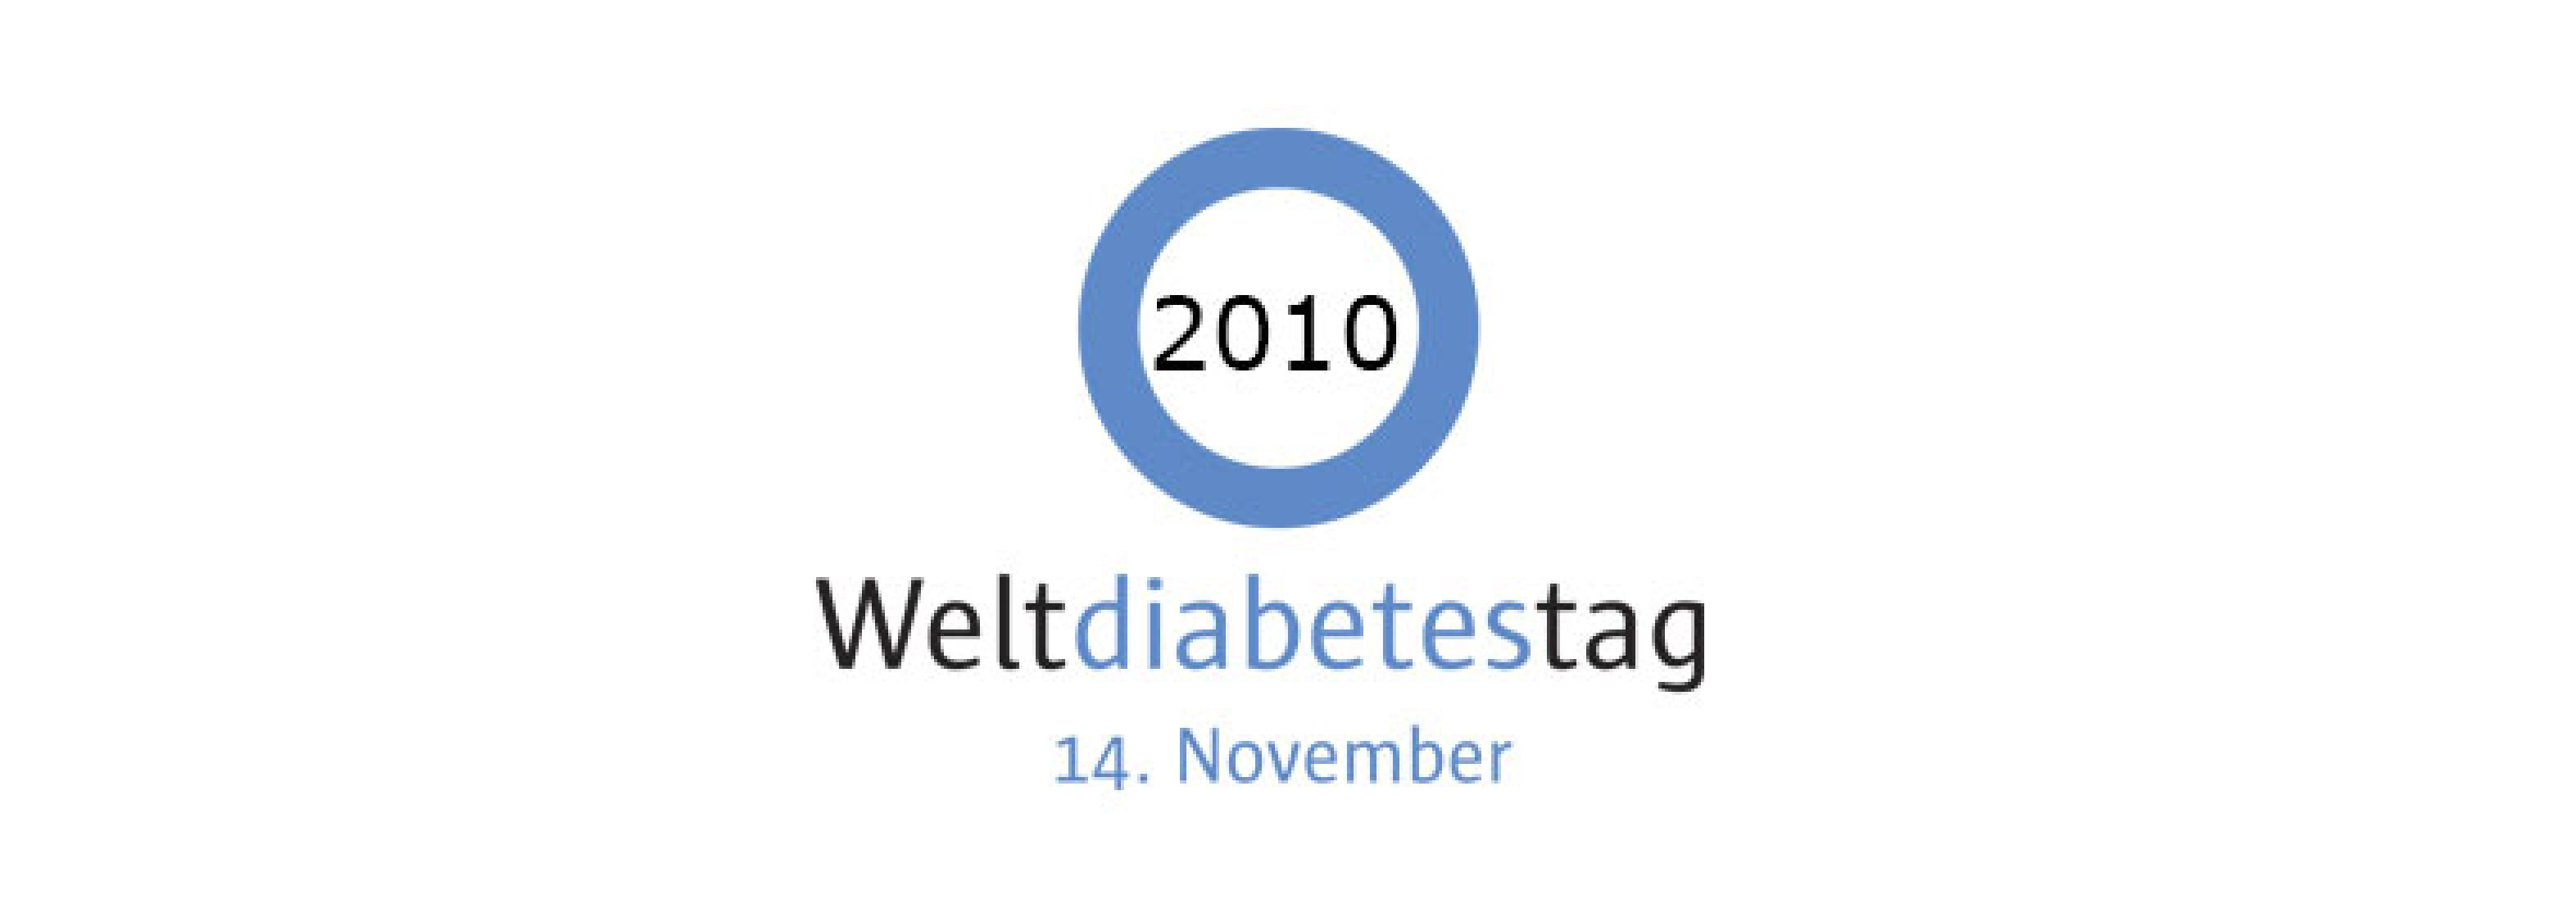 Hero-Bild kurz Logo Weltdiabetestag 2010